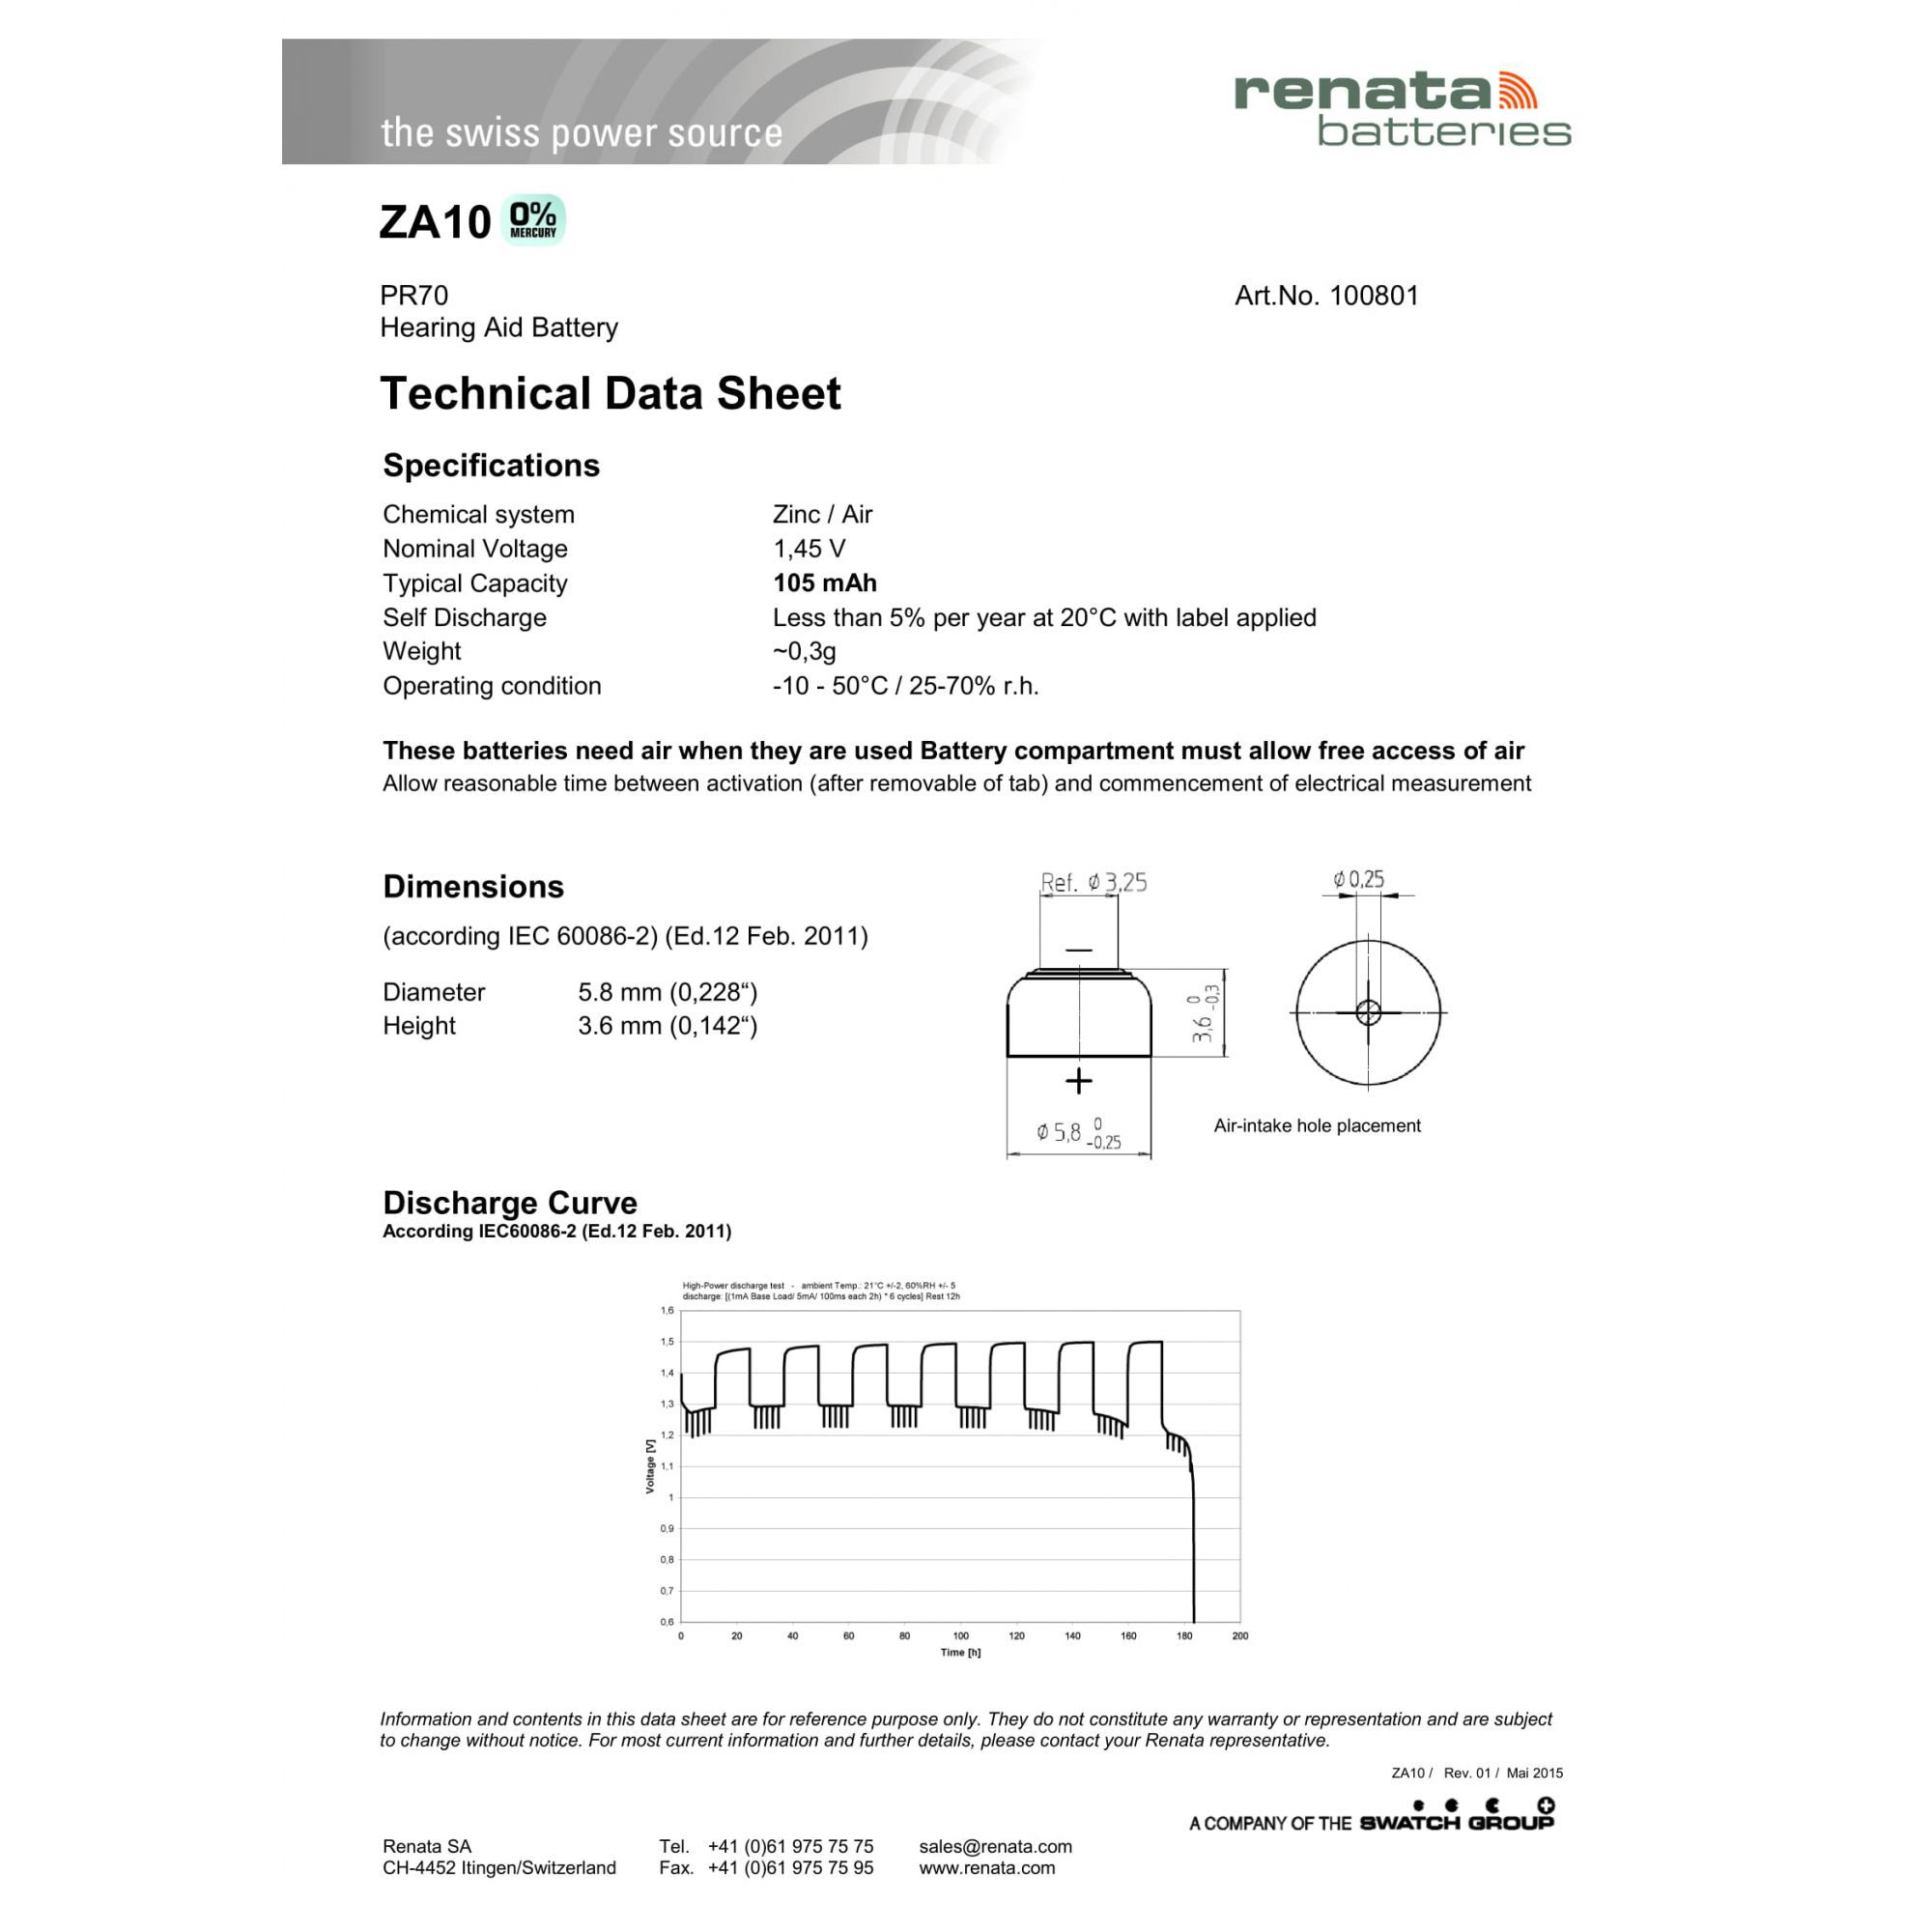 30 Baterias Pilhas Auditiva 10 RENATA ZA10 - 05 cartelas